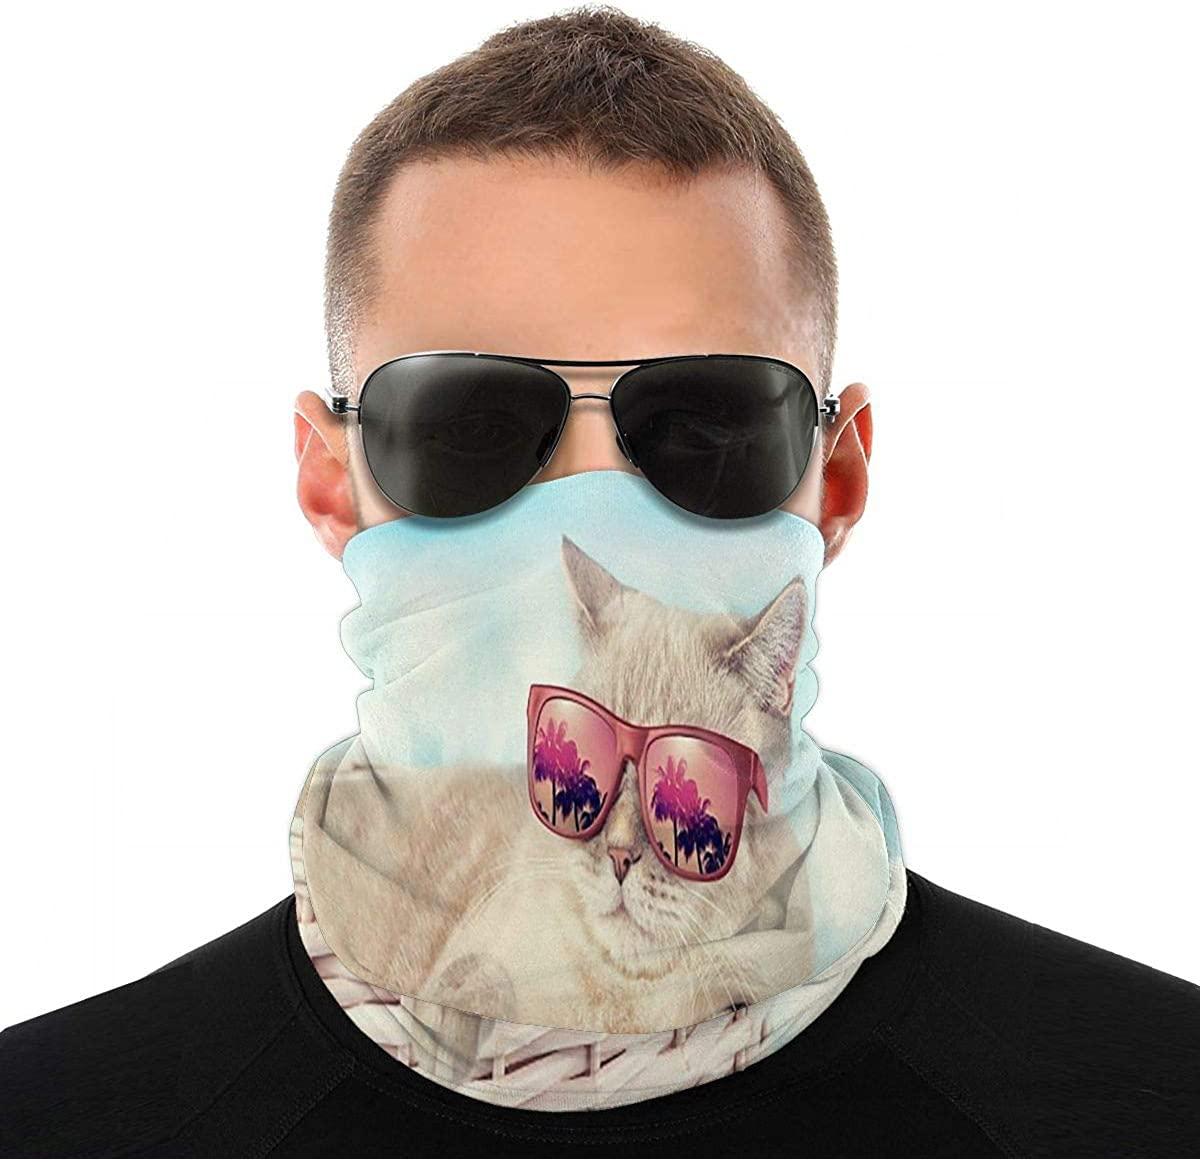 Kiuloam Bandanas Face Mask, The Cat In Sunglasses Lying In A Basket Neck Gaiter Mask Headband for Men Women Face Scarf Dust, Outdoors, Sports